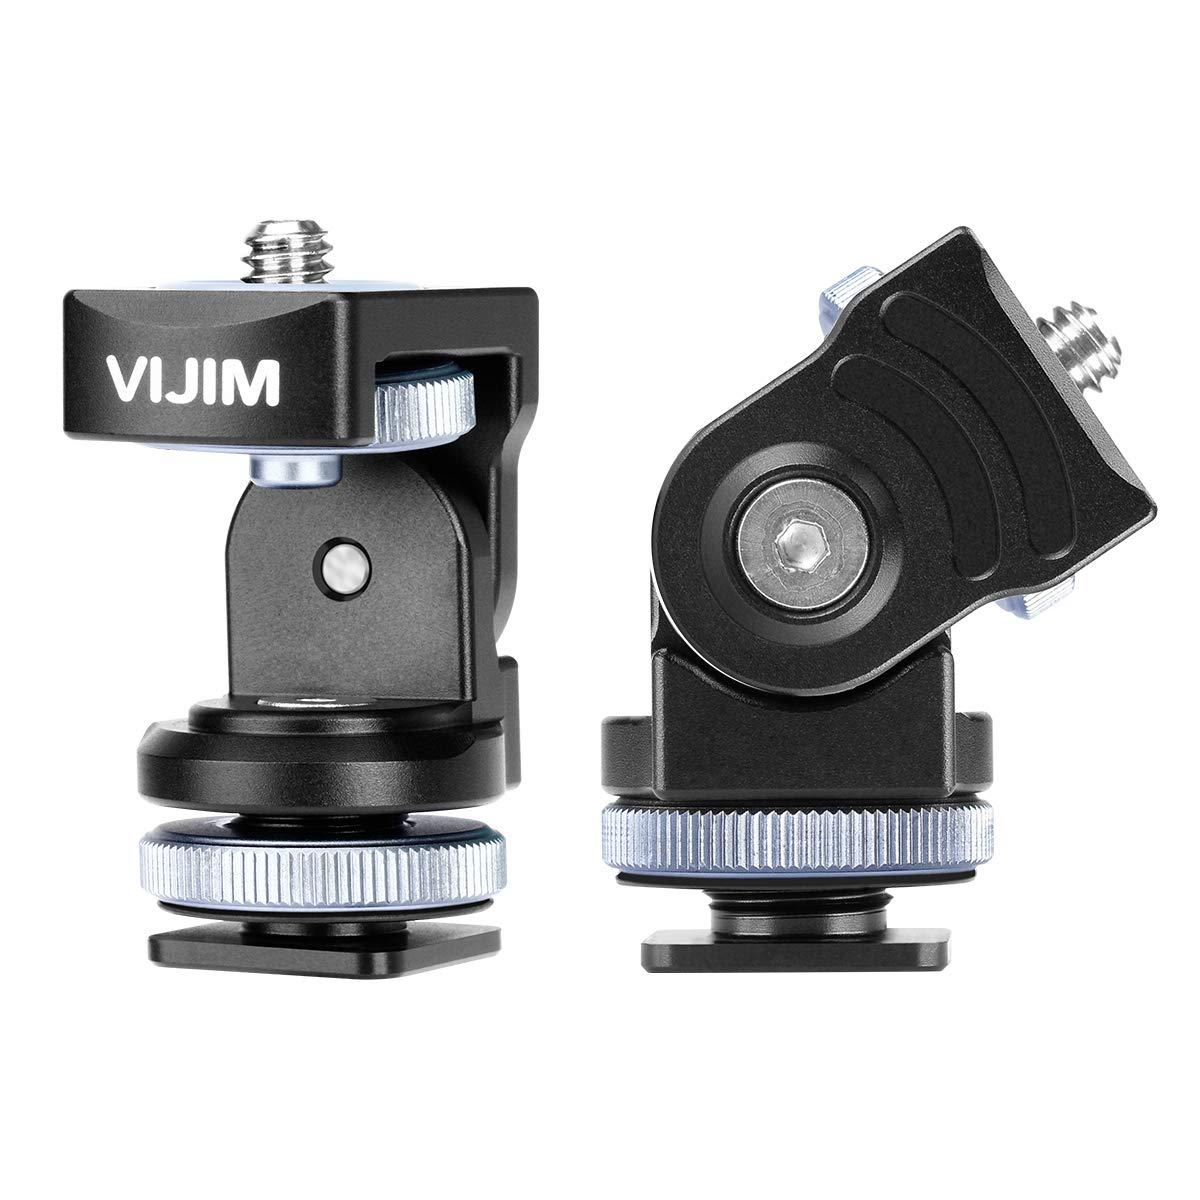 VIJIM Hot Shoe Mount Tripod Adapter for Light Stand Panoramic Camera Monitor Holder Mount 360° Rotation for Sony Canon Nikon DSLR Camera by VIJIM